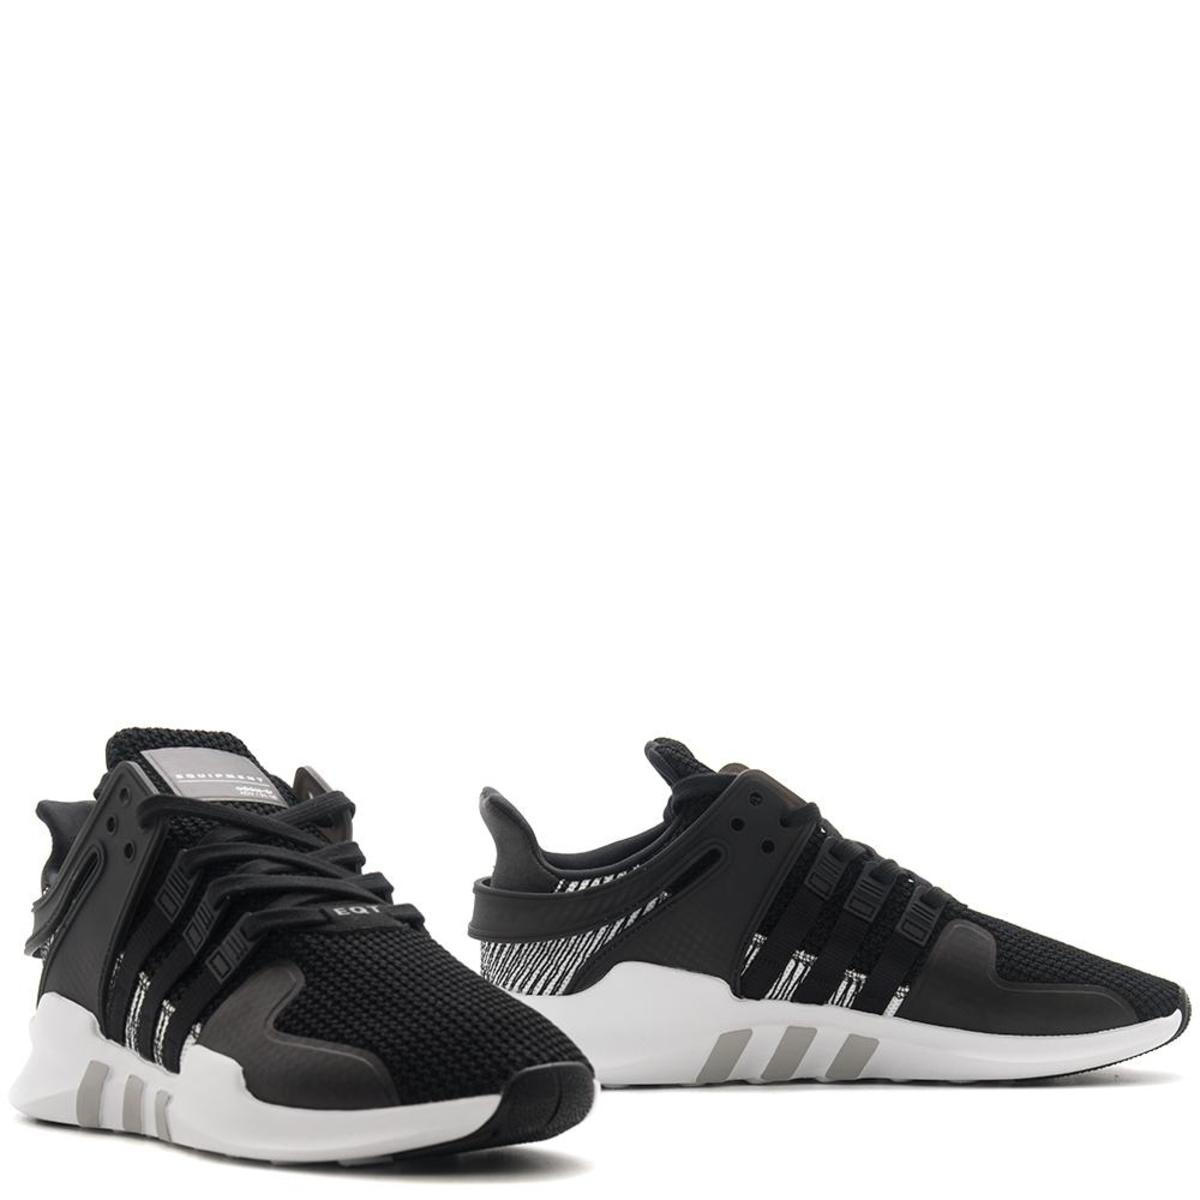 best sneakers 6f029 53eac ADIDAS ORIGINALS EQT SUPPORT ADV - CORE BLACK  Garmentory